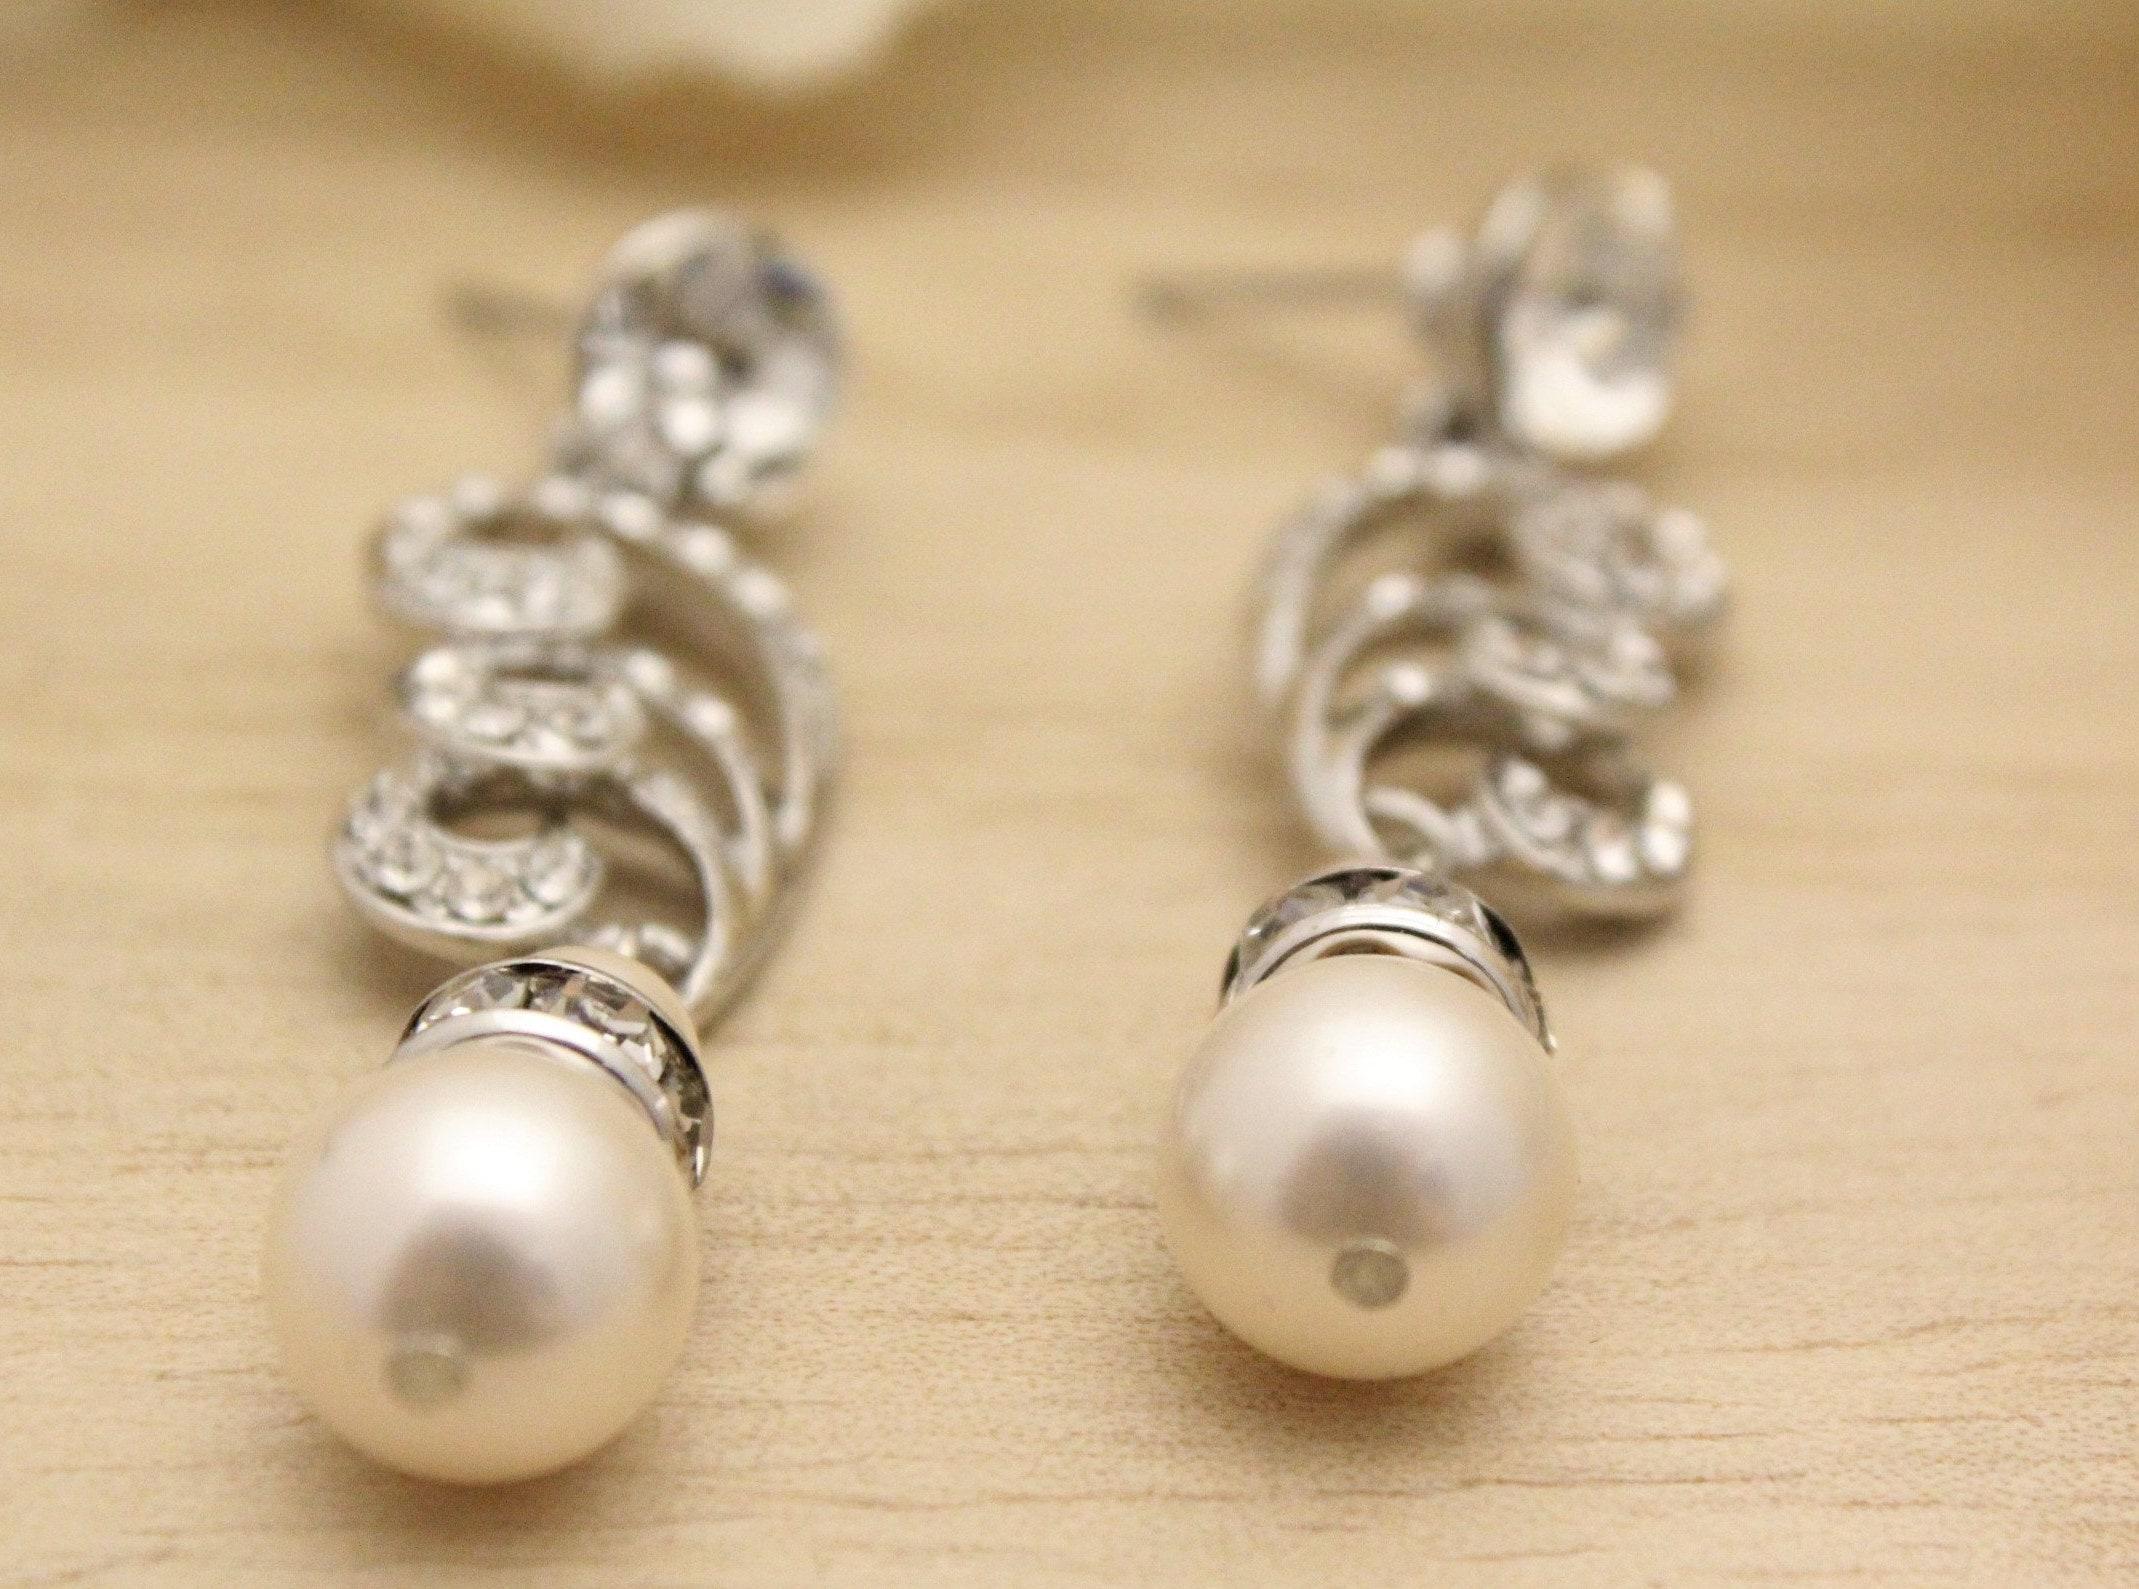 Wedding earrings brides studs bridal earrings pearl chandelier wedding earrings brides studs bridal earrings pearl chandelier earrings bridesmaid earrings crystal bridal earrings bridesamid earring gifts arubaitofo Images